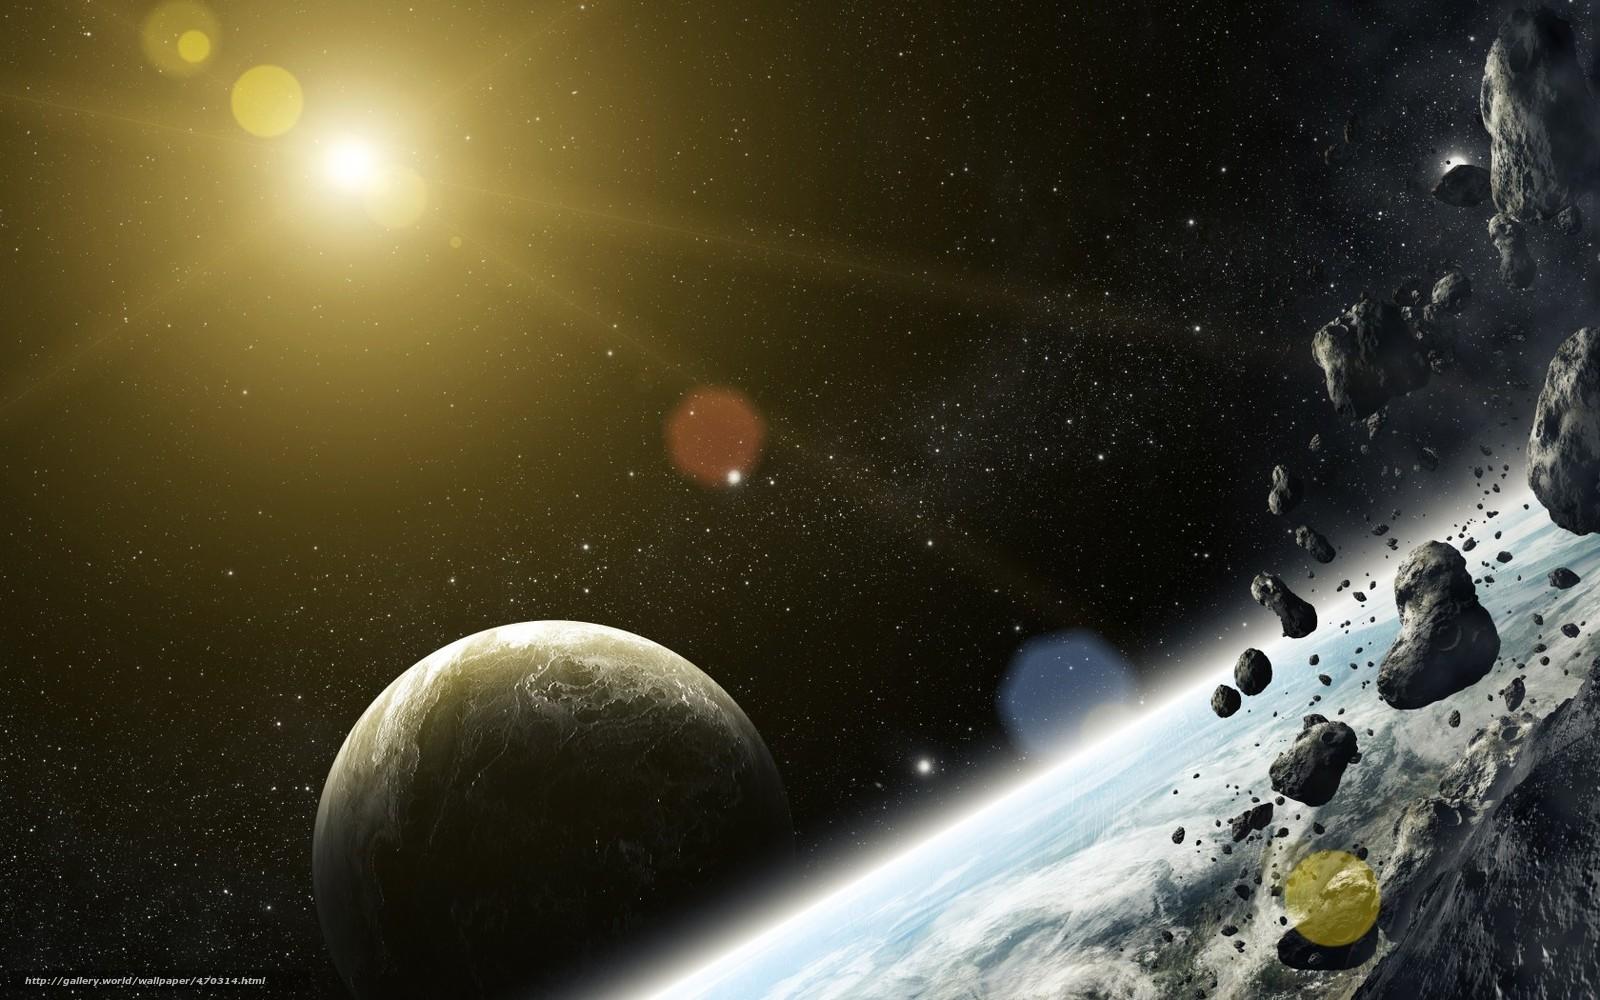 Скачать на телефон обои фото картинку на тему арт, космос, планеты, метеориты, камни, звезда, разширение 1680x1050